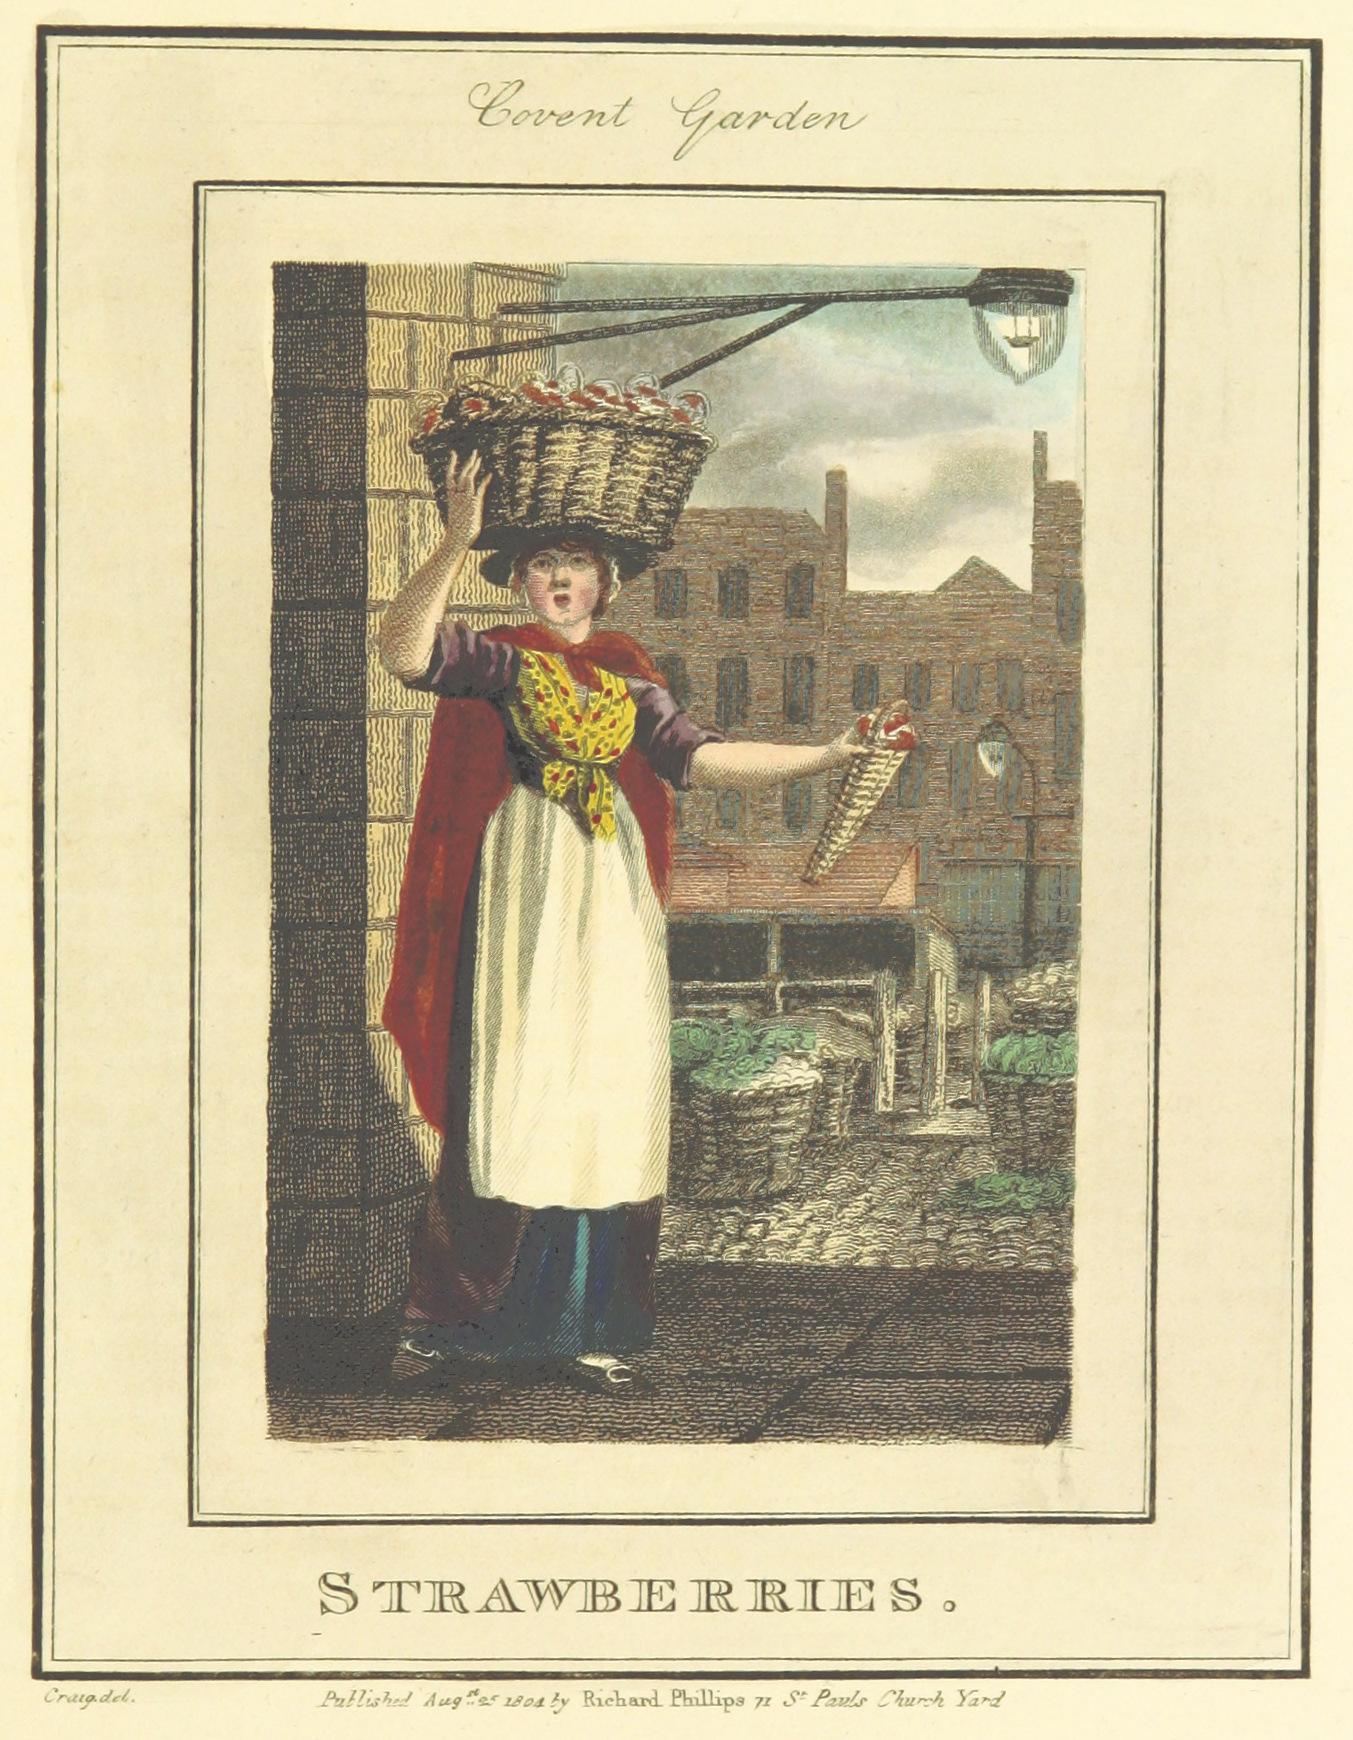 Phillips(1804)_p669_-_Covent_Garden_-_Strawberries